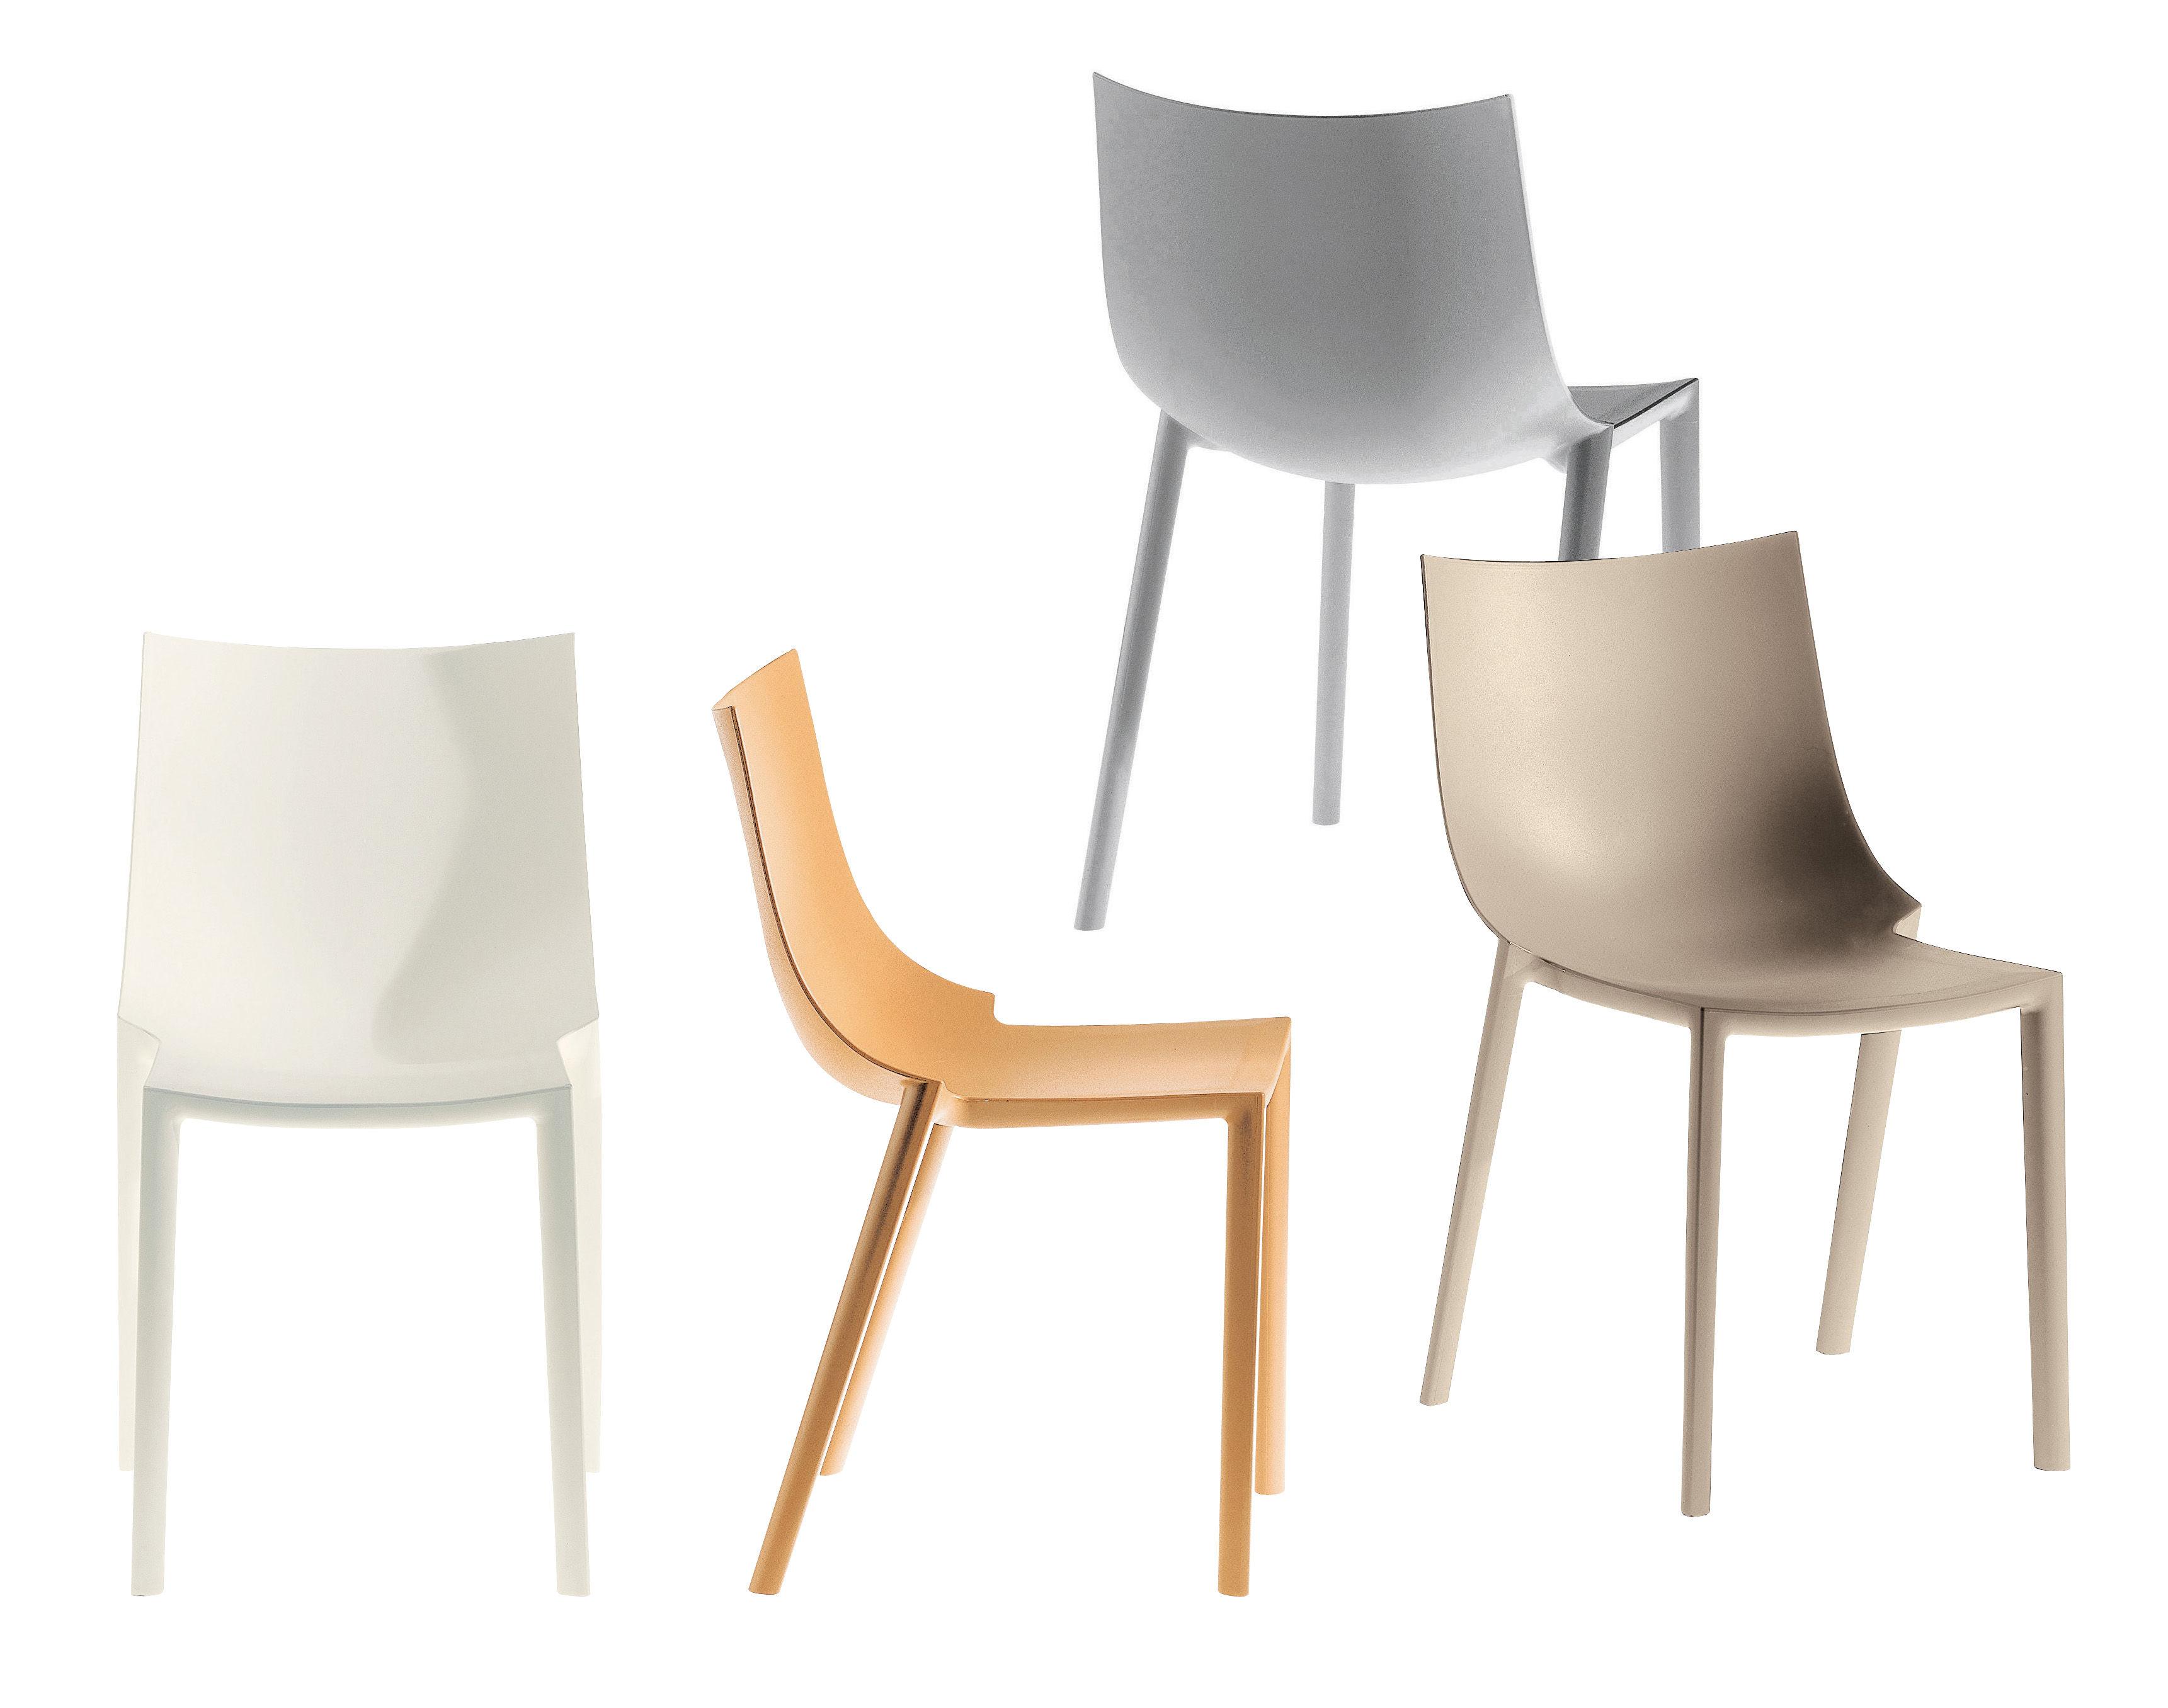 chaise empilable bo plastique marron clair driade made in design. Black Bedroom Furniture Sets. Home Design Ideas